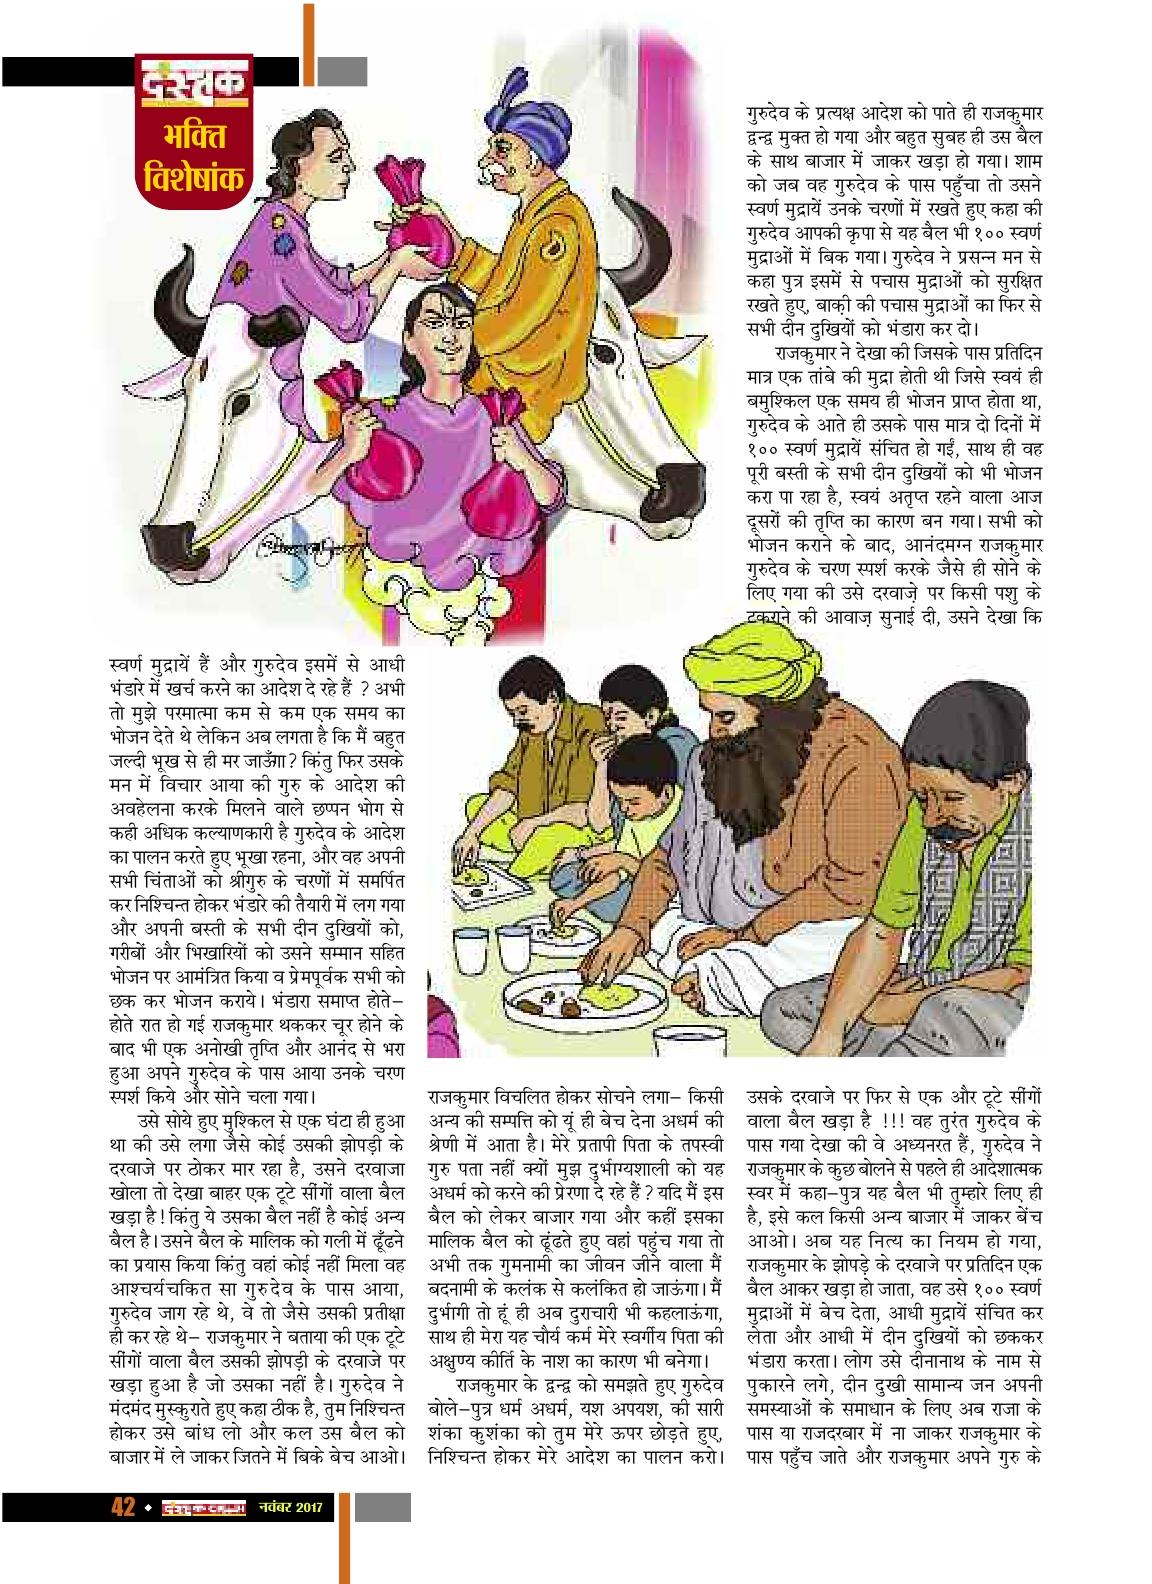 aasutosh rana magazine----mobile copy44